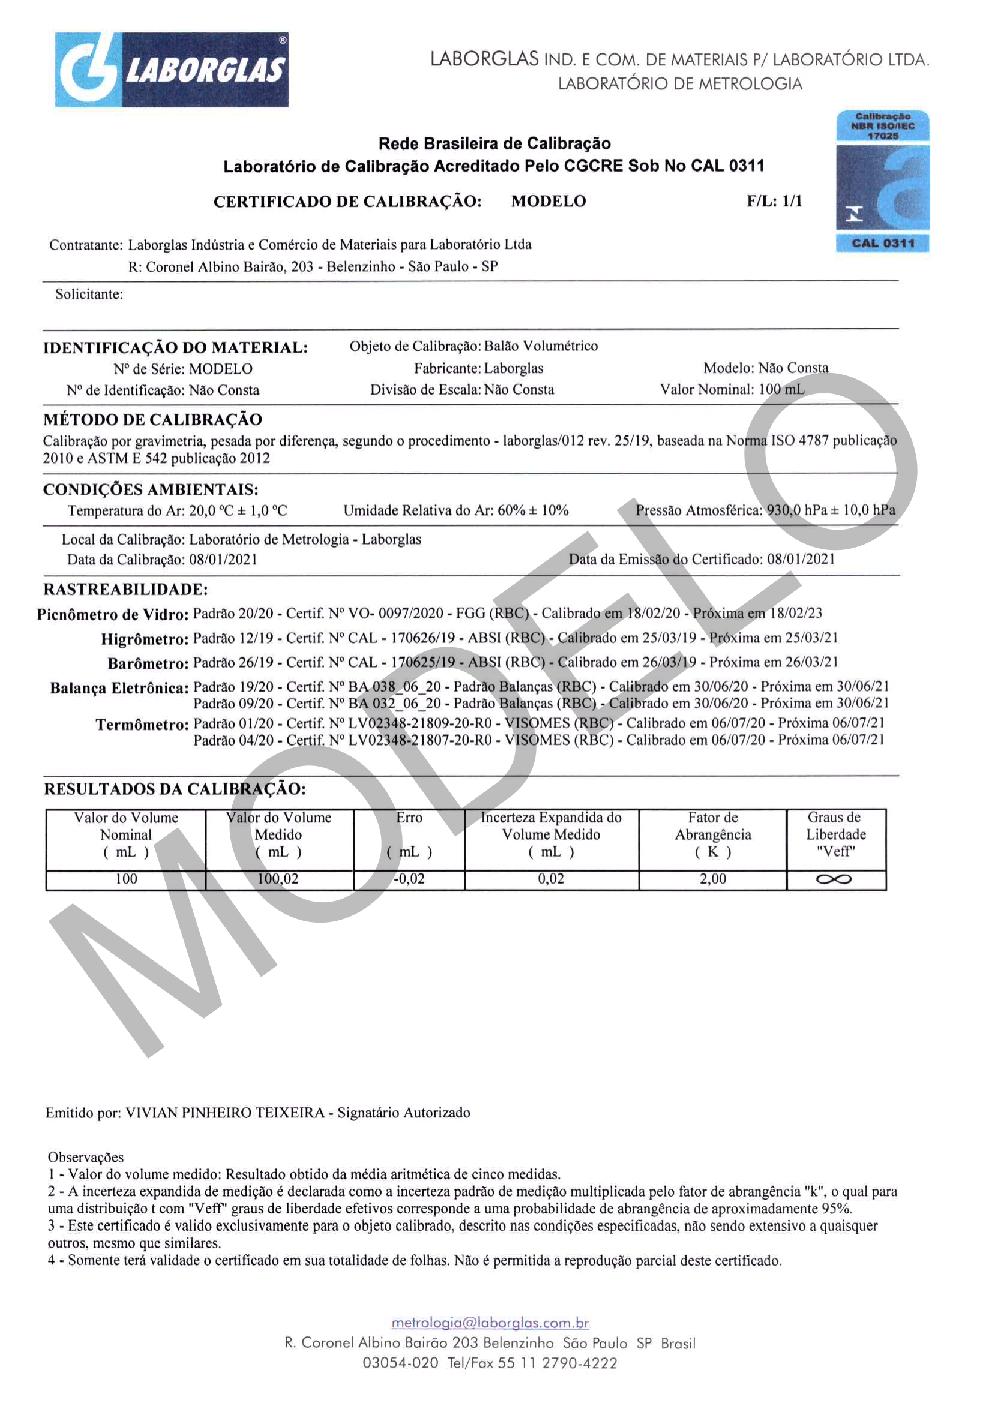 BALÃO VOLUMÉTRICO CLASSE A ROLHA POLI C/ CERTIFICADO RBC 5000 ML - Marca Laborglas - Cód. 9167873-R